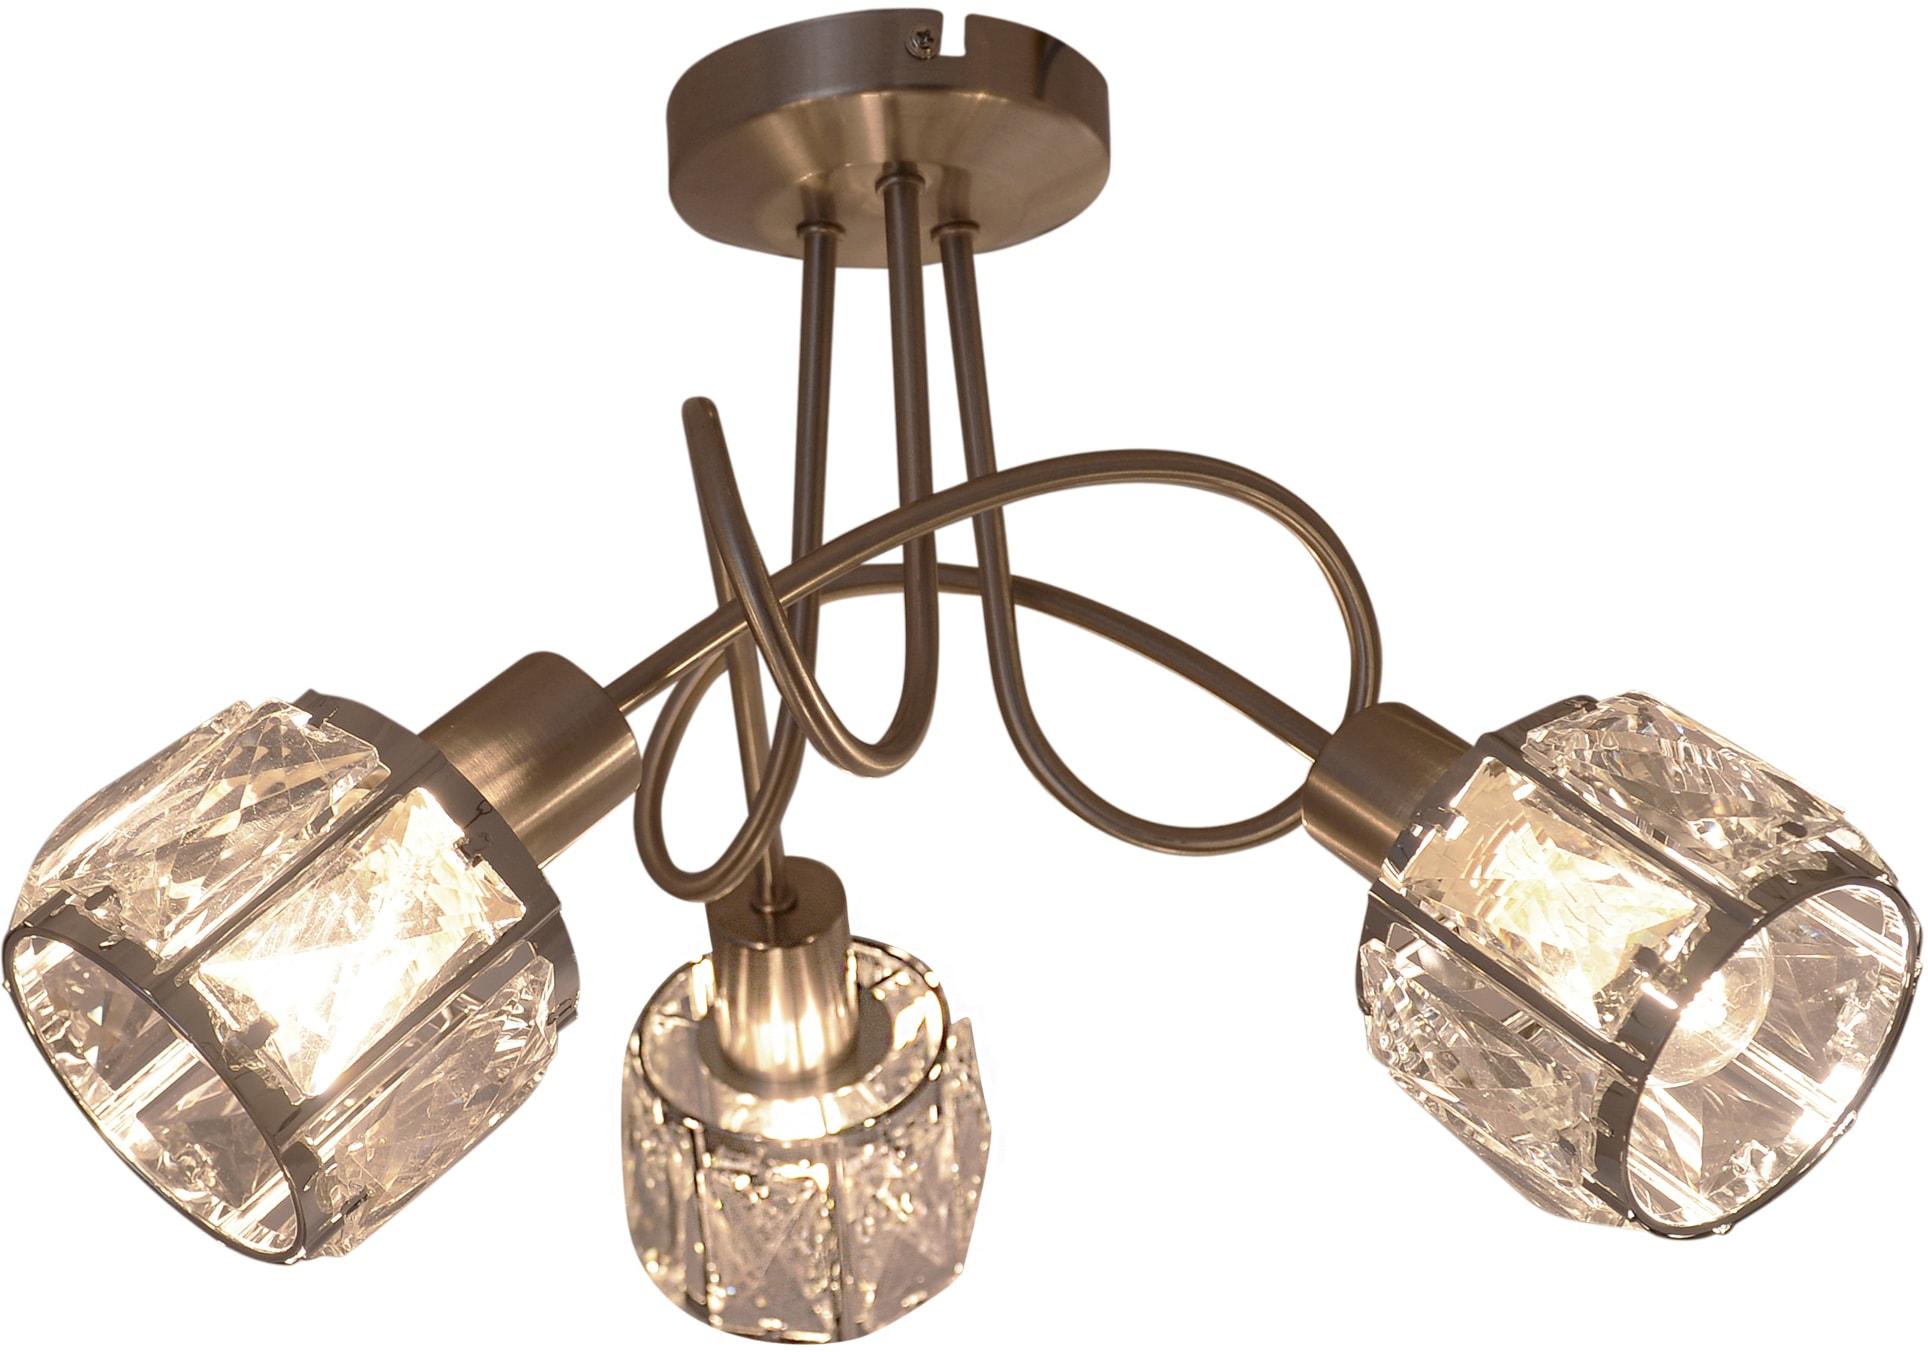 näve LED Deckenspot Josefa, E14, 1 St., Warmweiß, LED Deckenleuchte, LED Deckenlampe